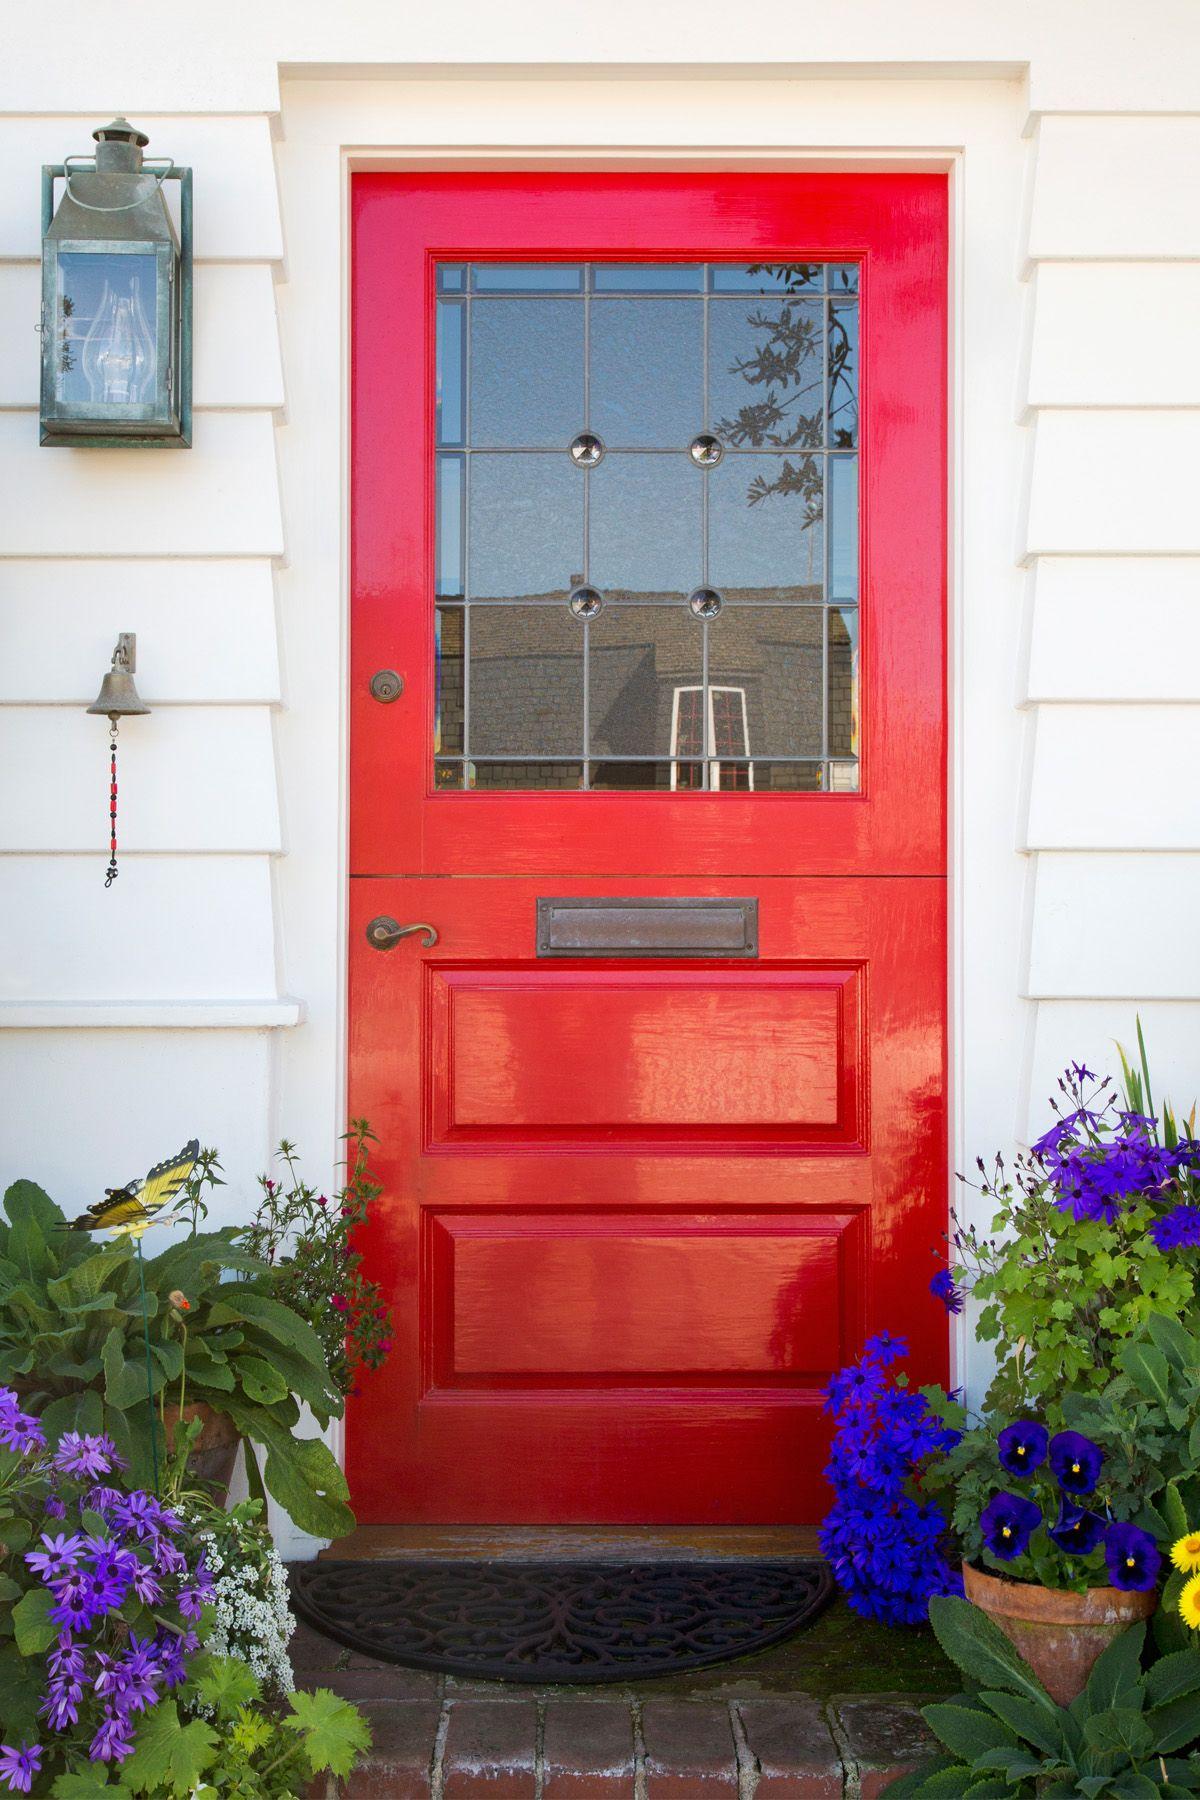 Home Converter Housing Torx Bit J41510